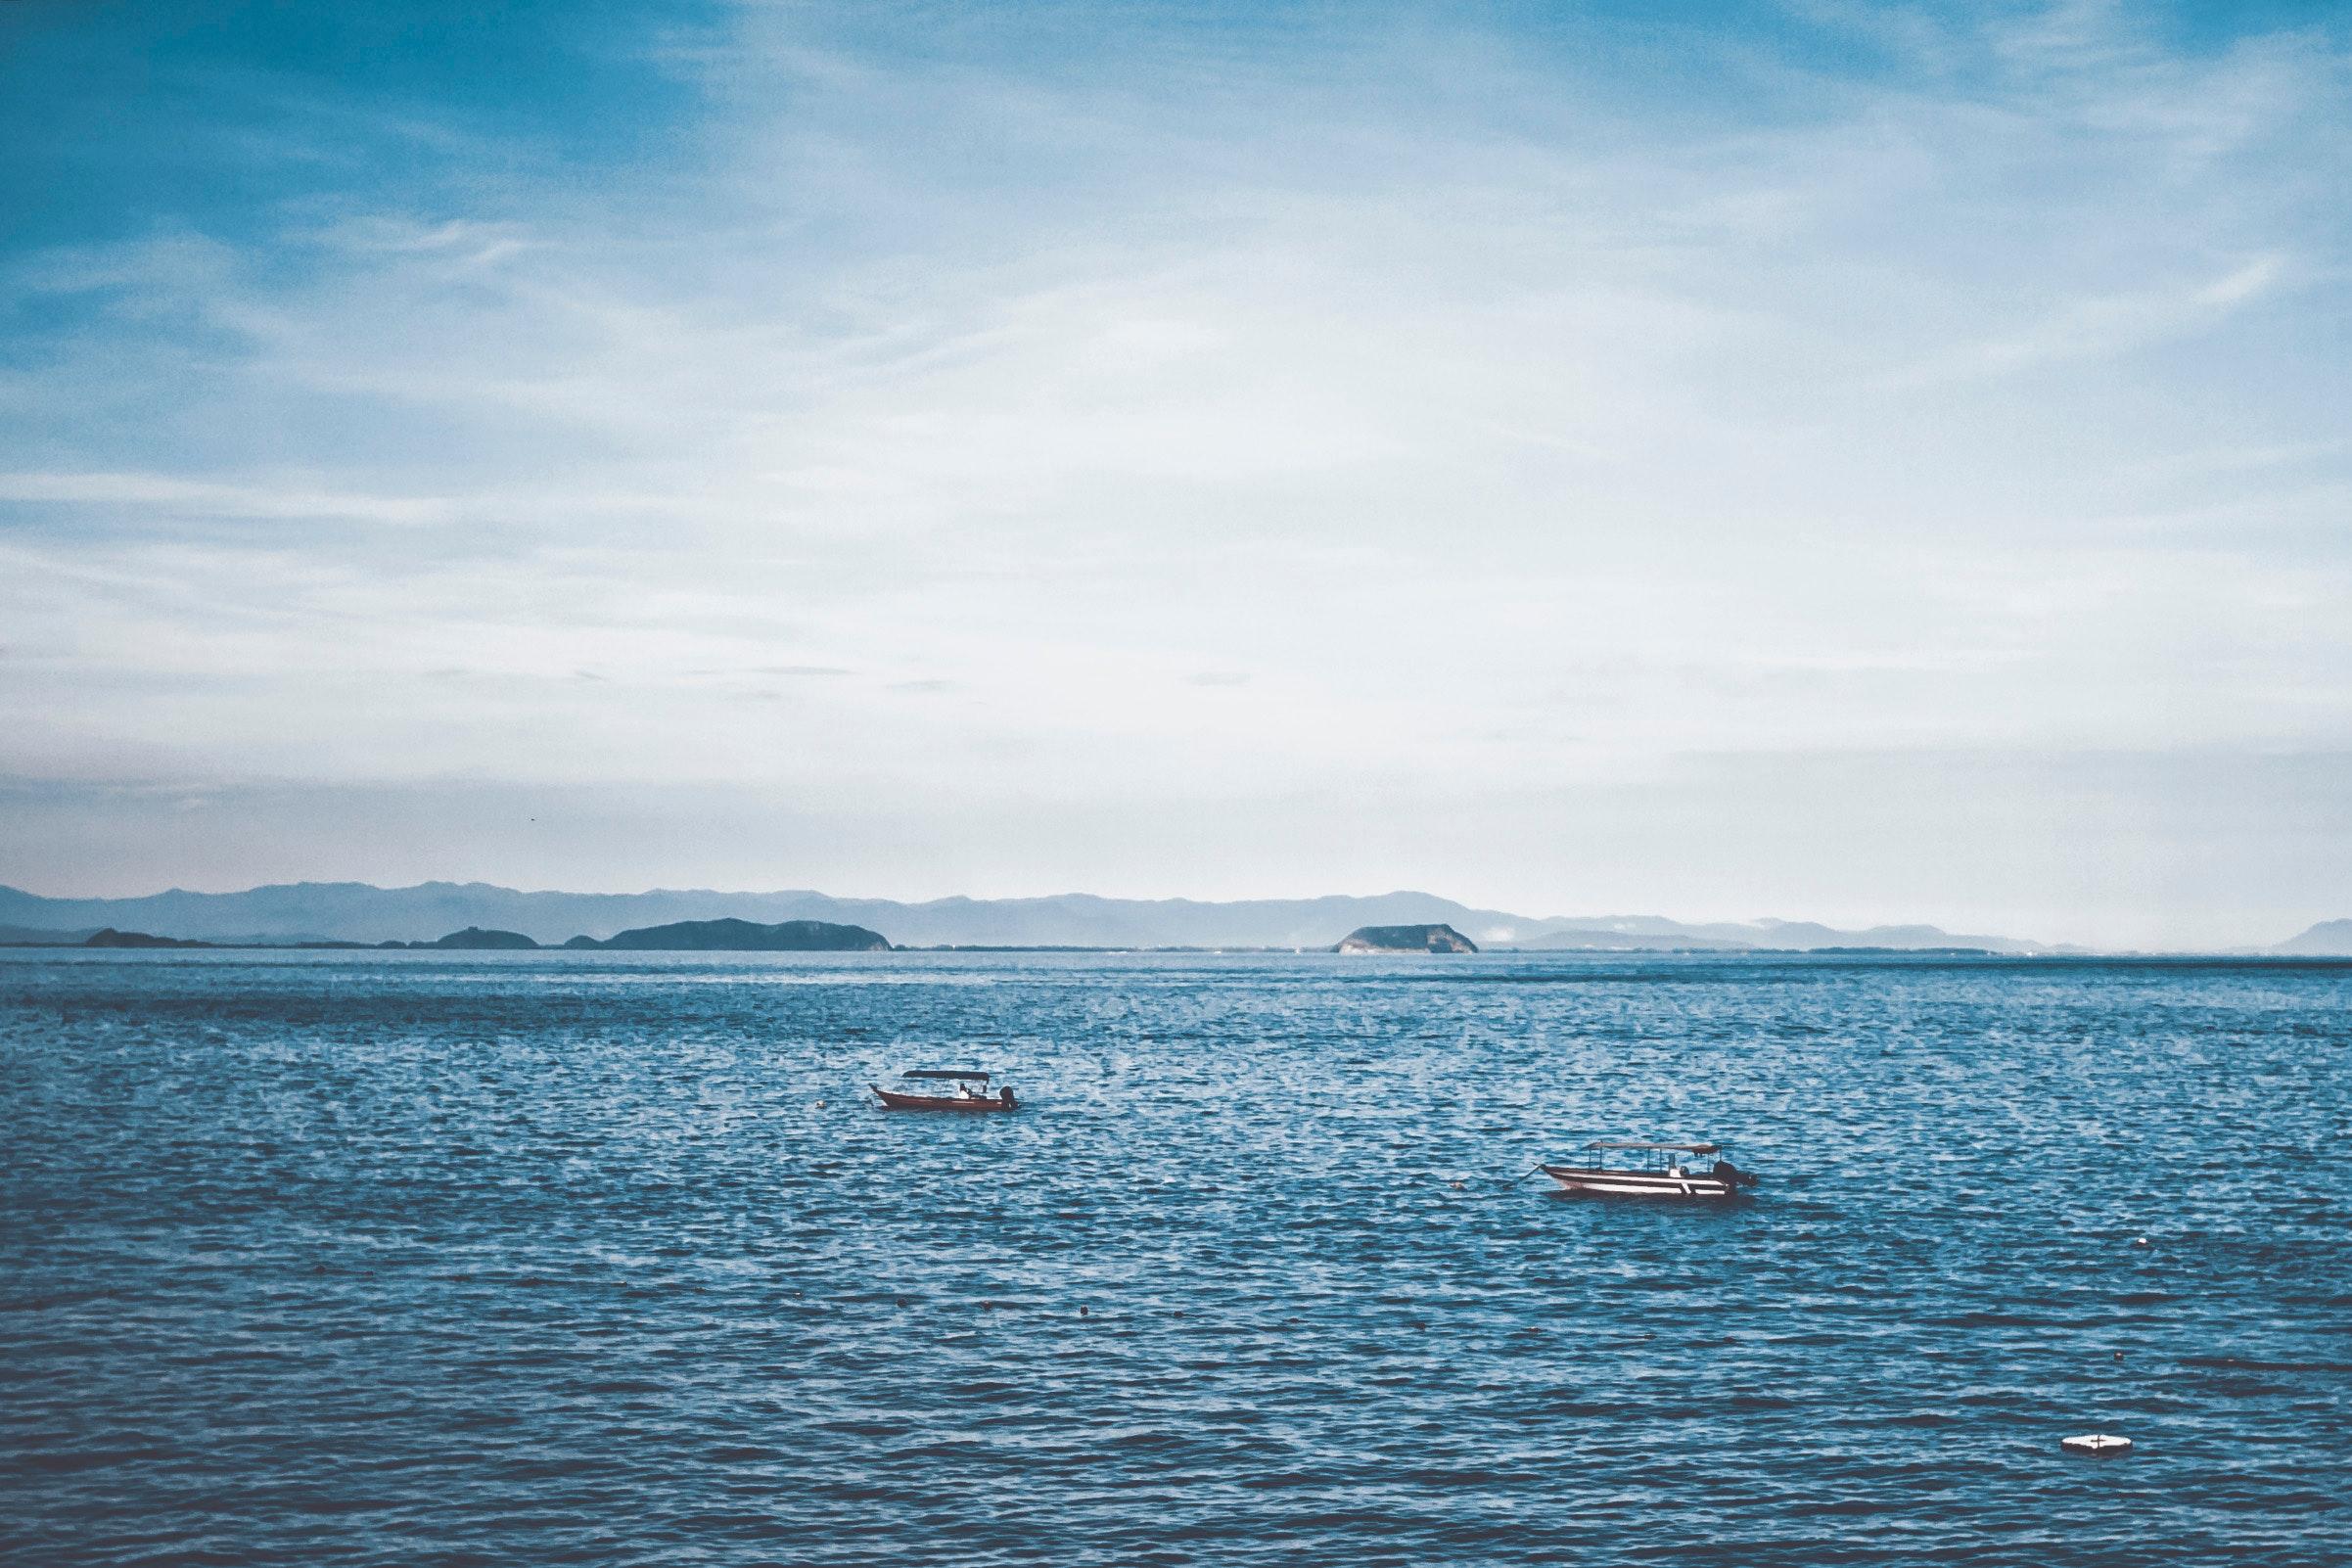 Two boats in ocean photo